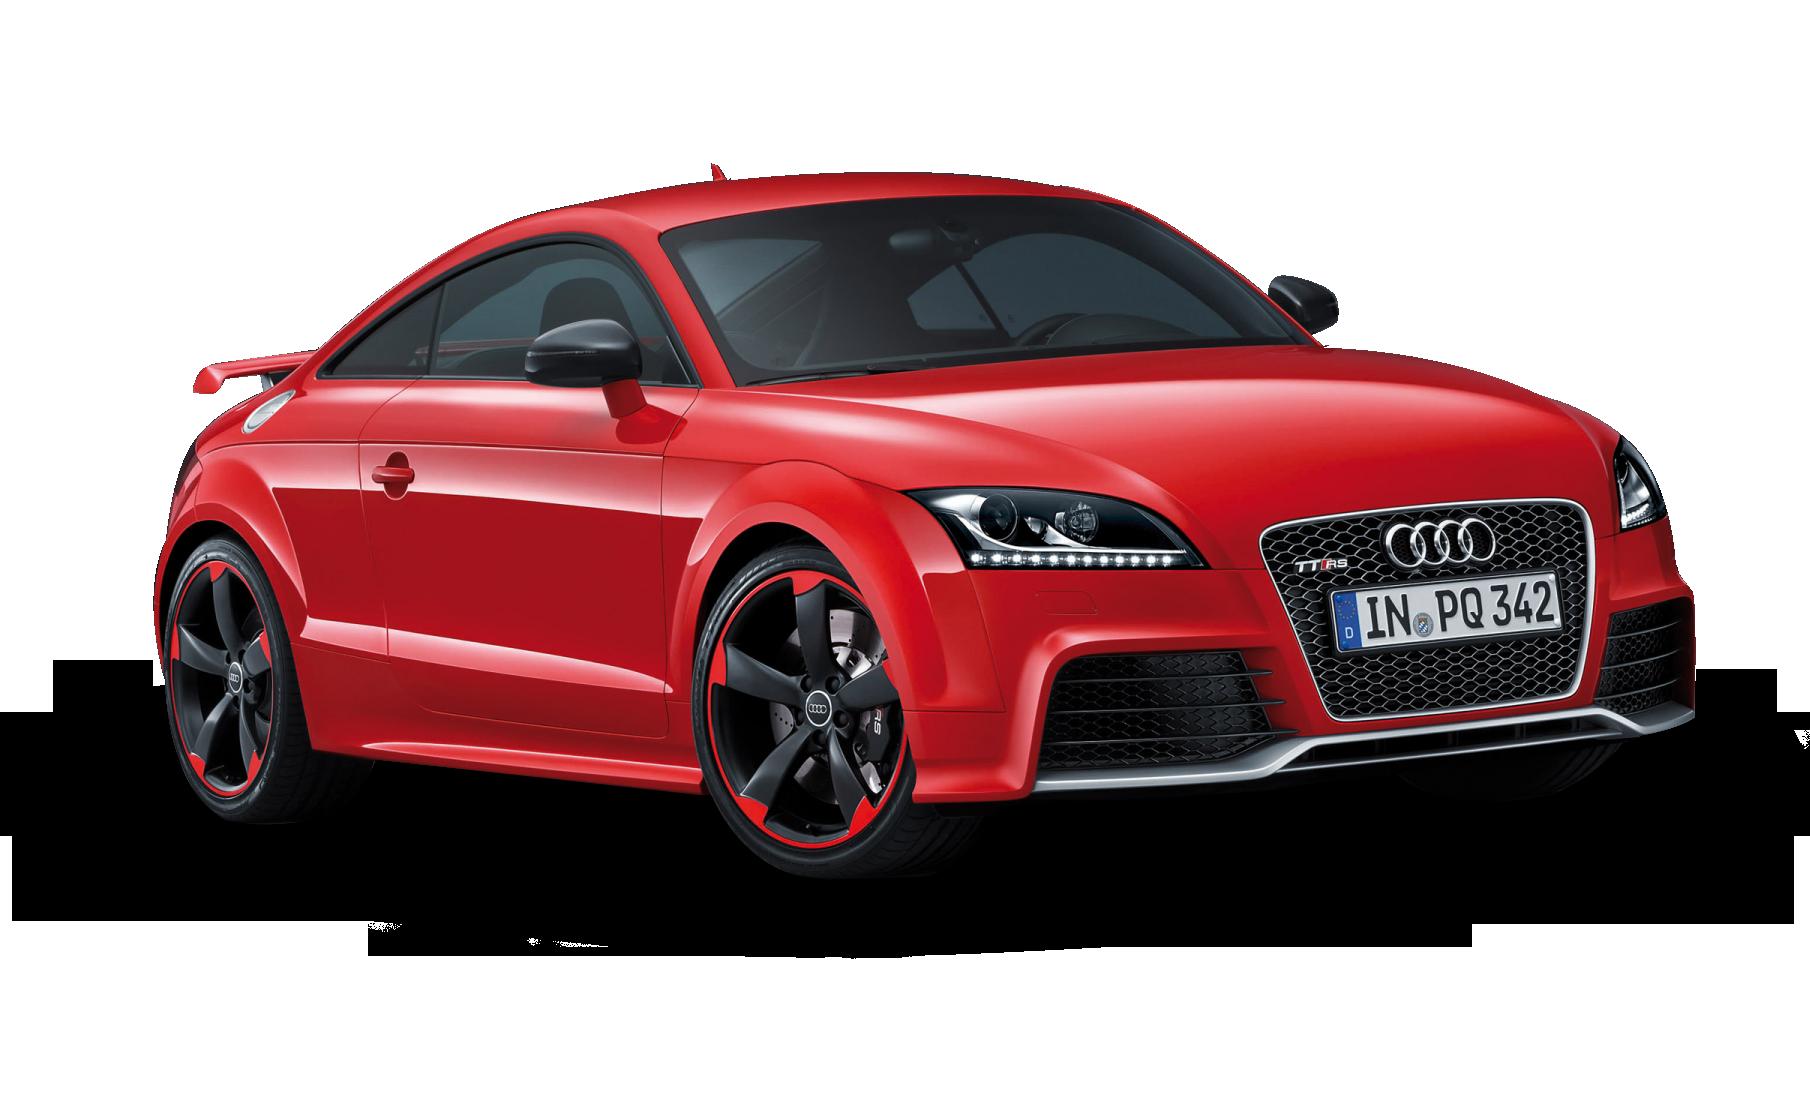 Audi car clipart clipart royalty free stock Red Audi Car PNG Image - PurePNG   Free transparent CC0 PNG Image ... clipart royalty free stock